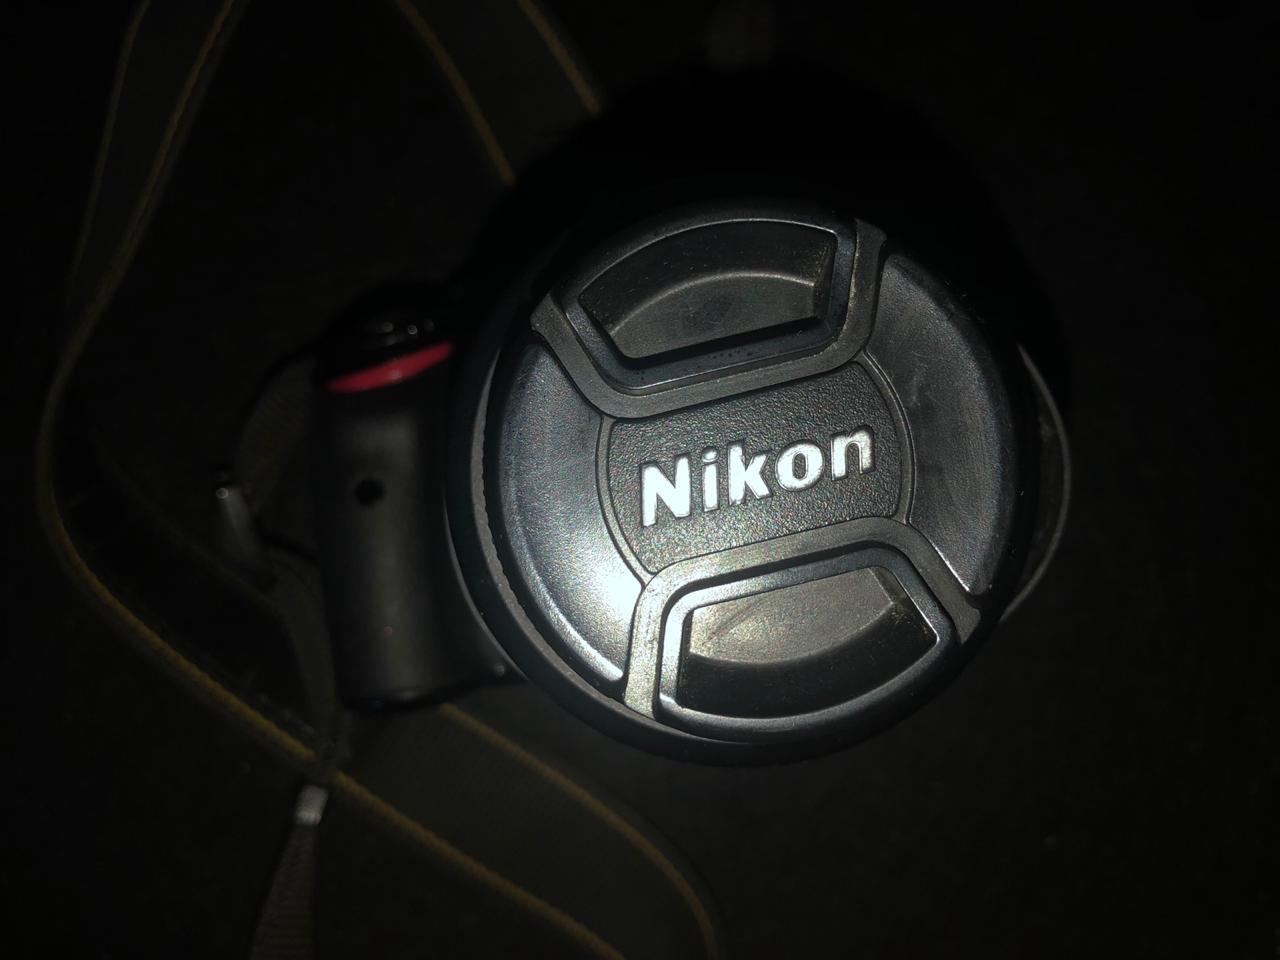 Nikon D5100 18-55mm linza 16.2 megapixel 1080p HD video 360